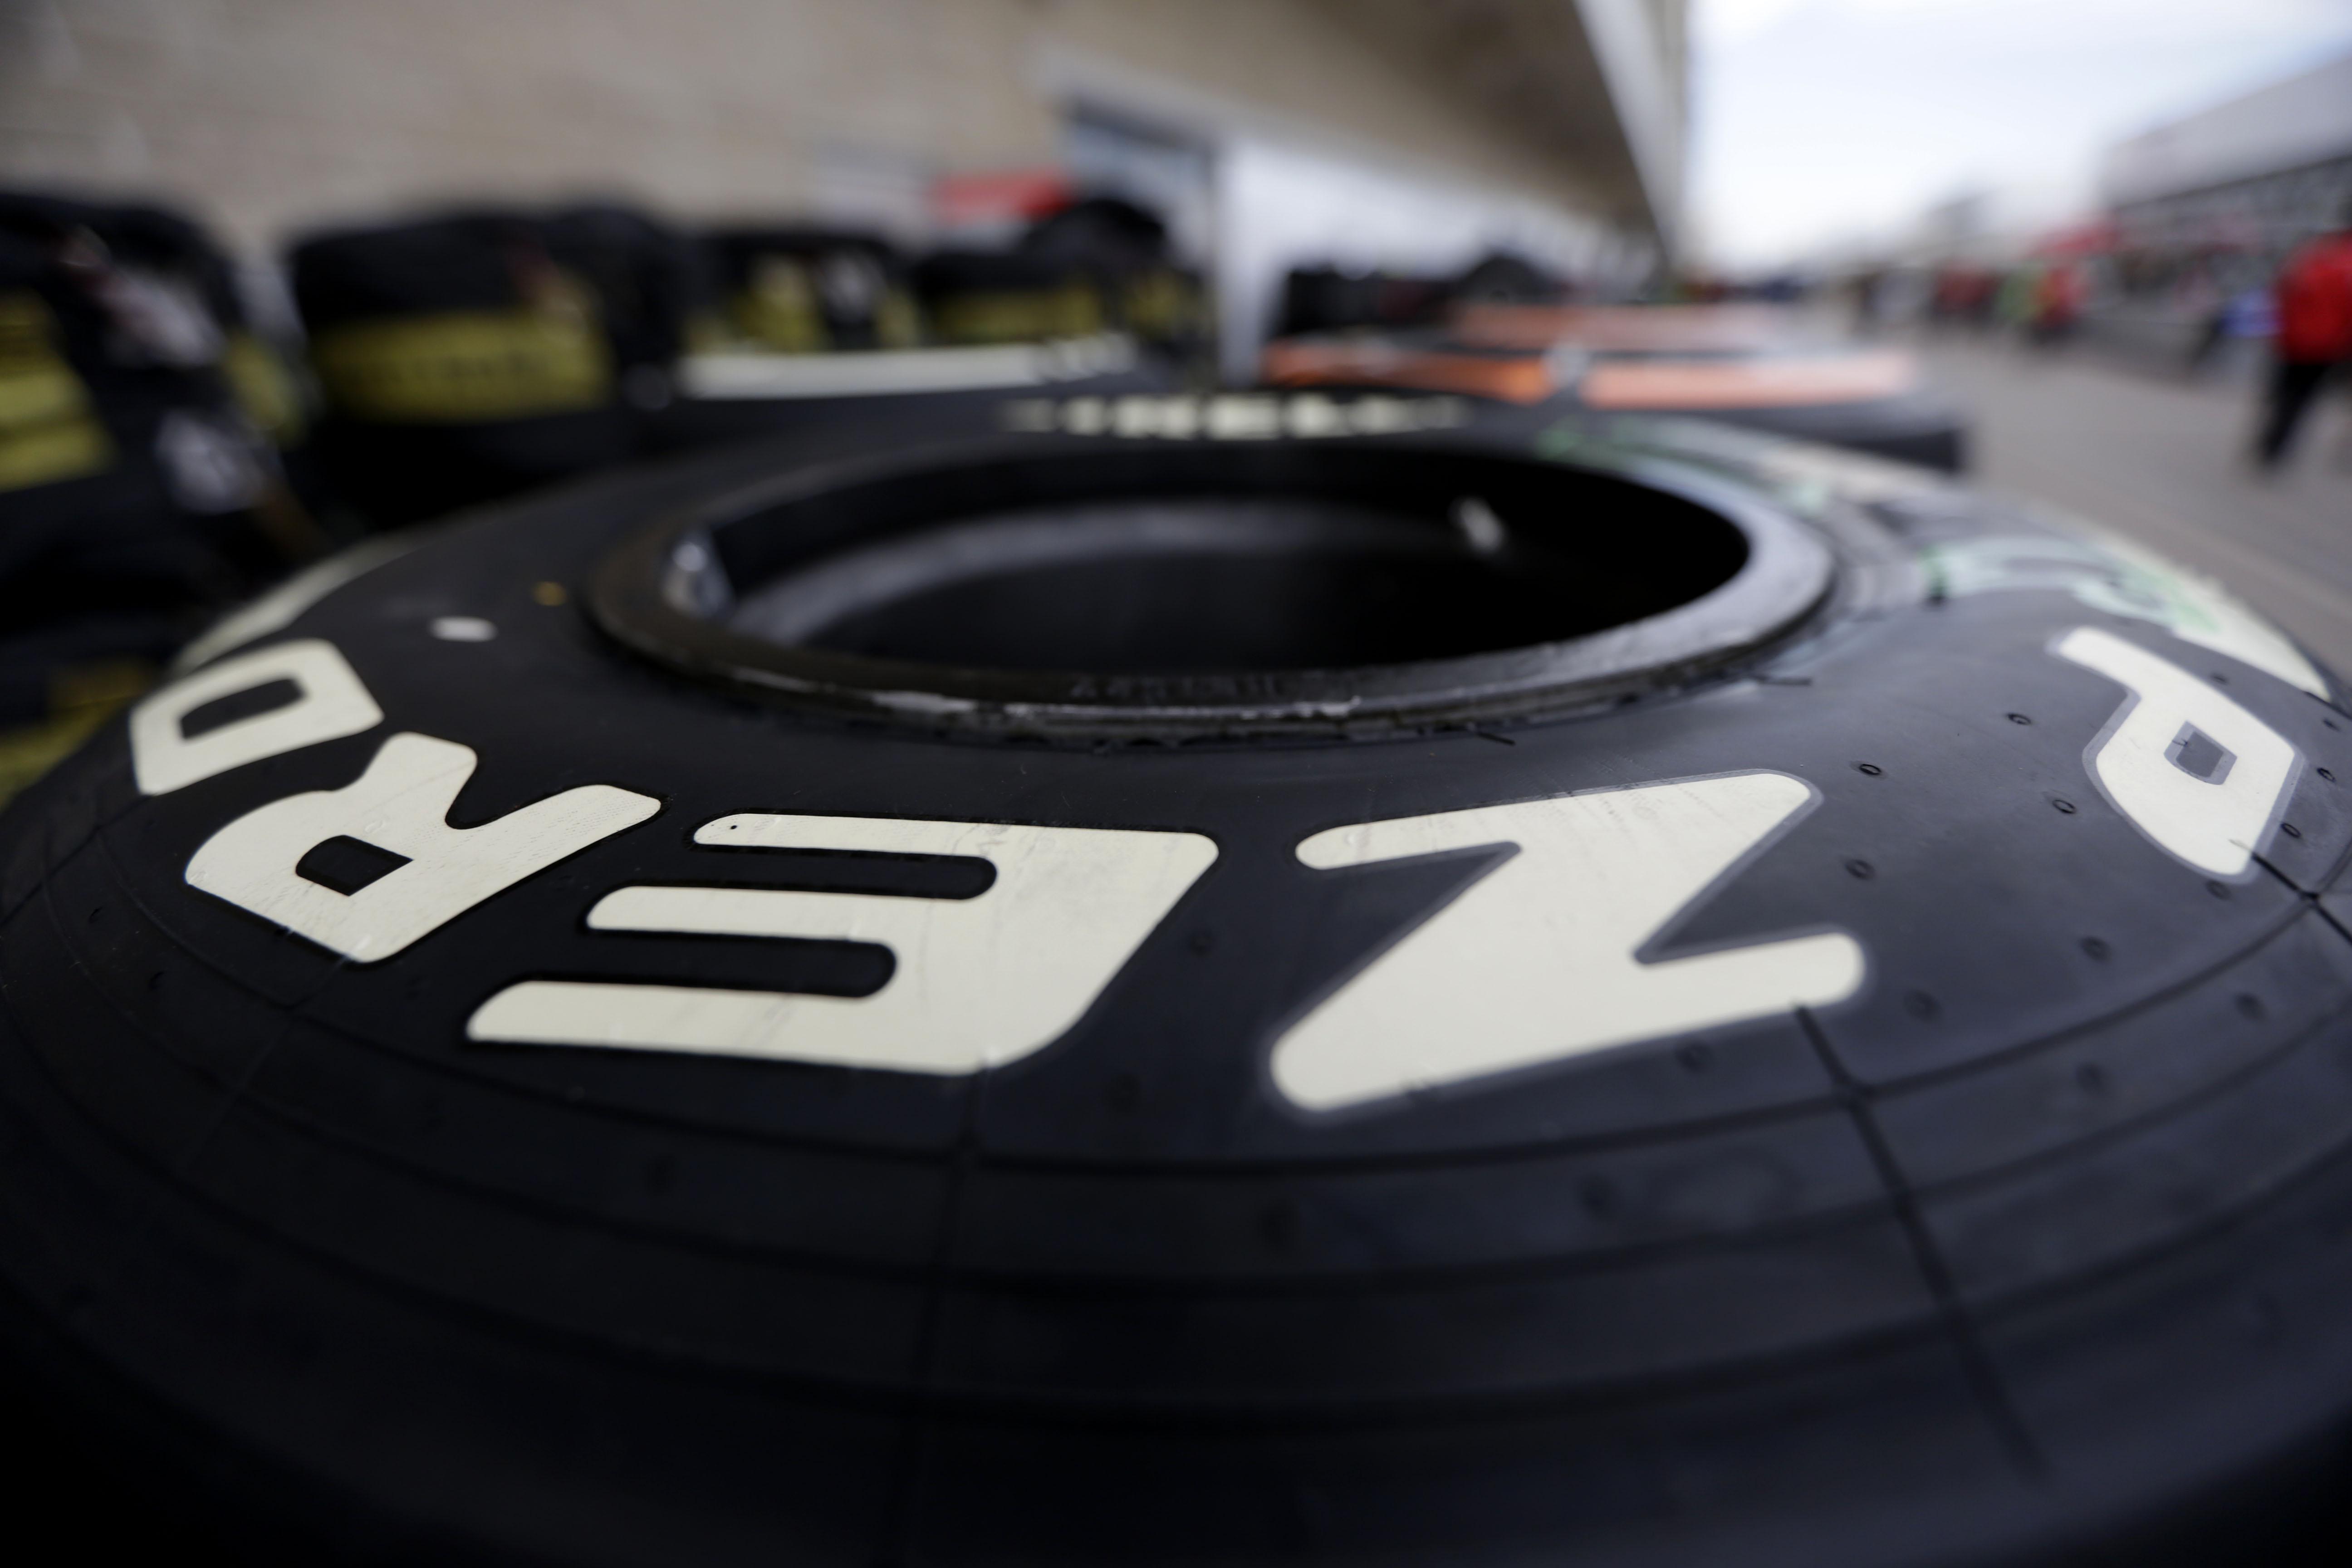 Pirelli: test in Bahrain secondo i programmi